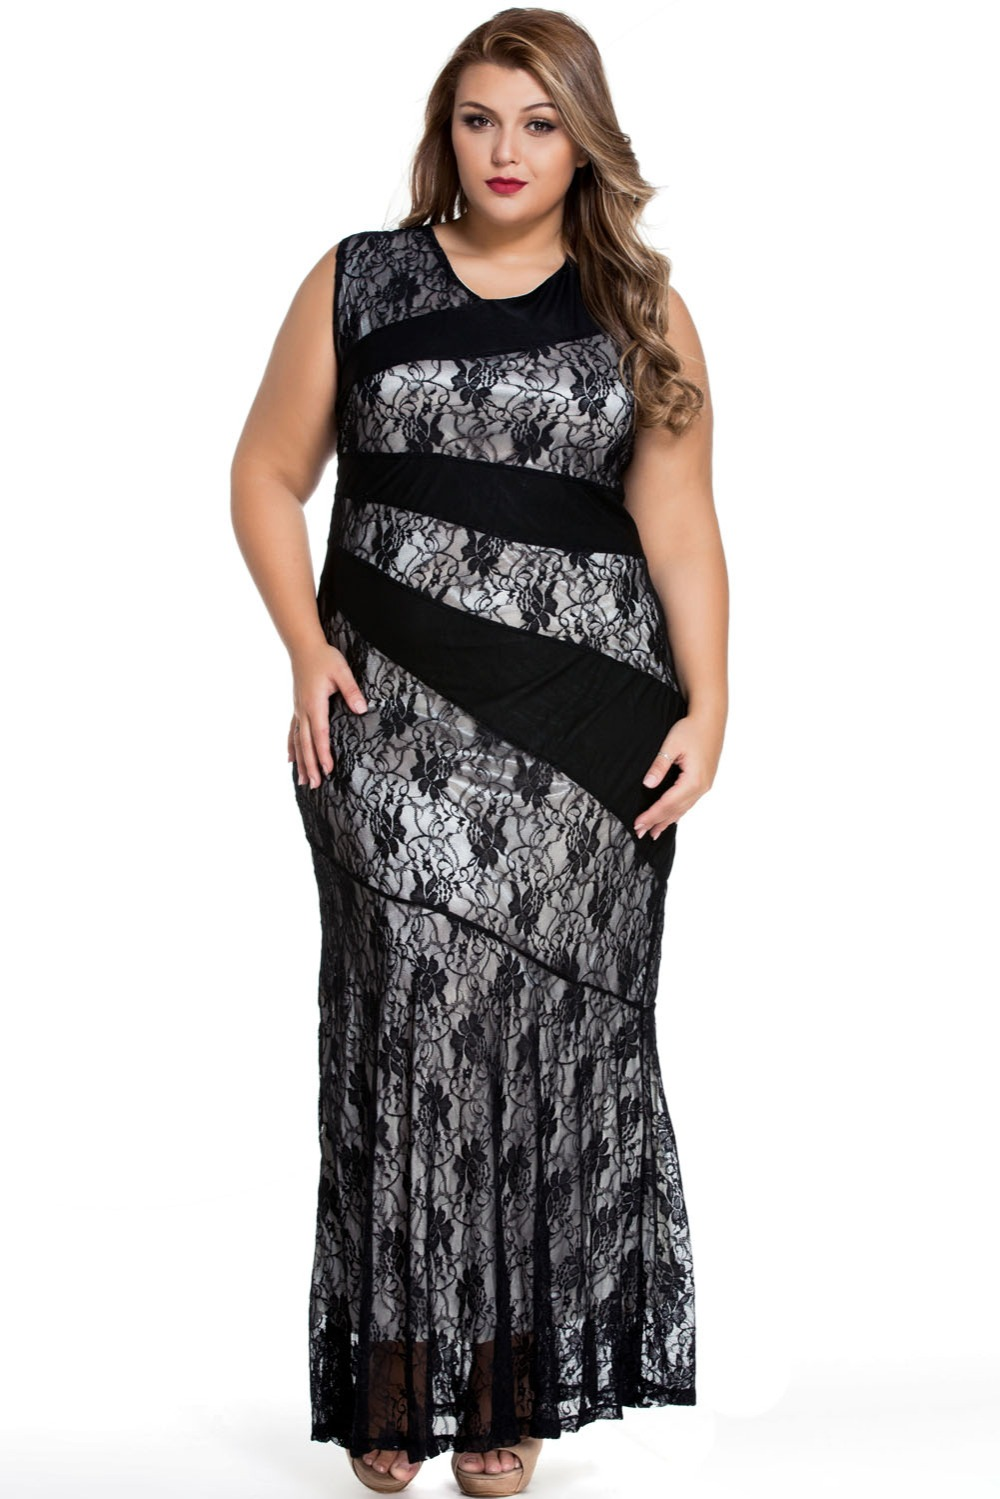 Cfanny 2016 New Black Red Blue Stylish Lace Splice Plus